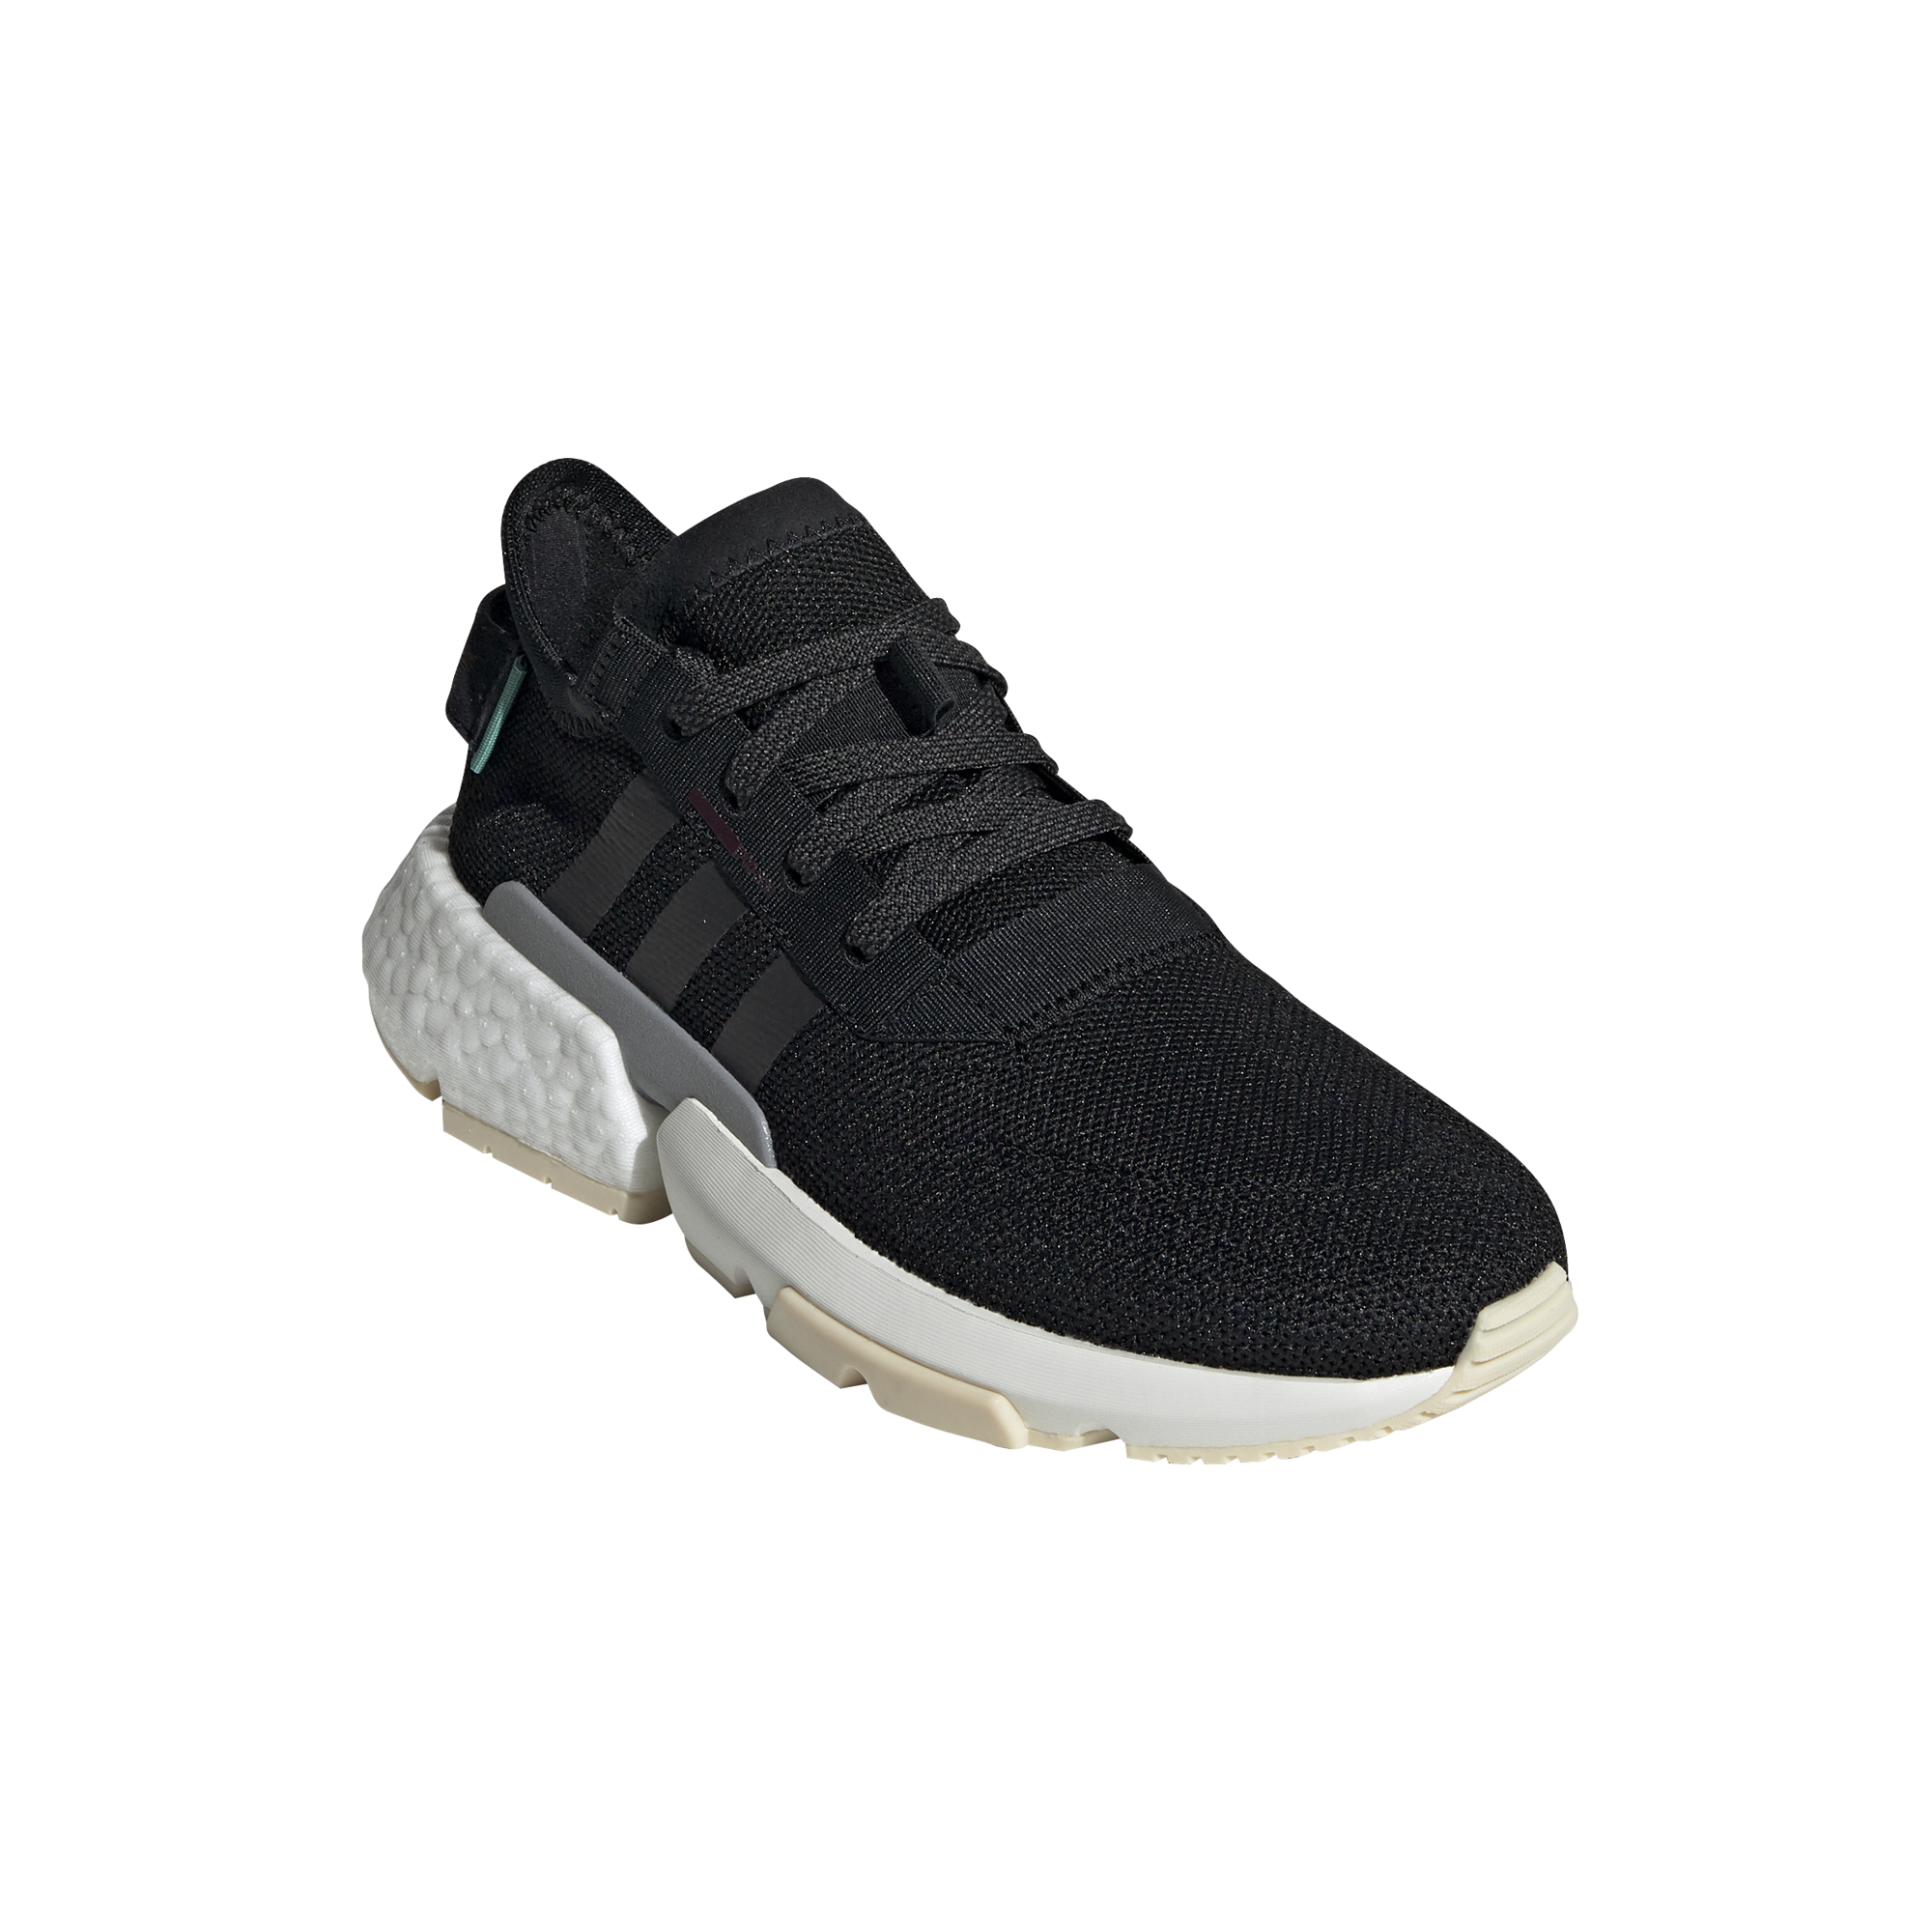 Chaussures femme adidas POD-S3.1